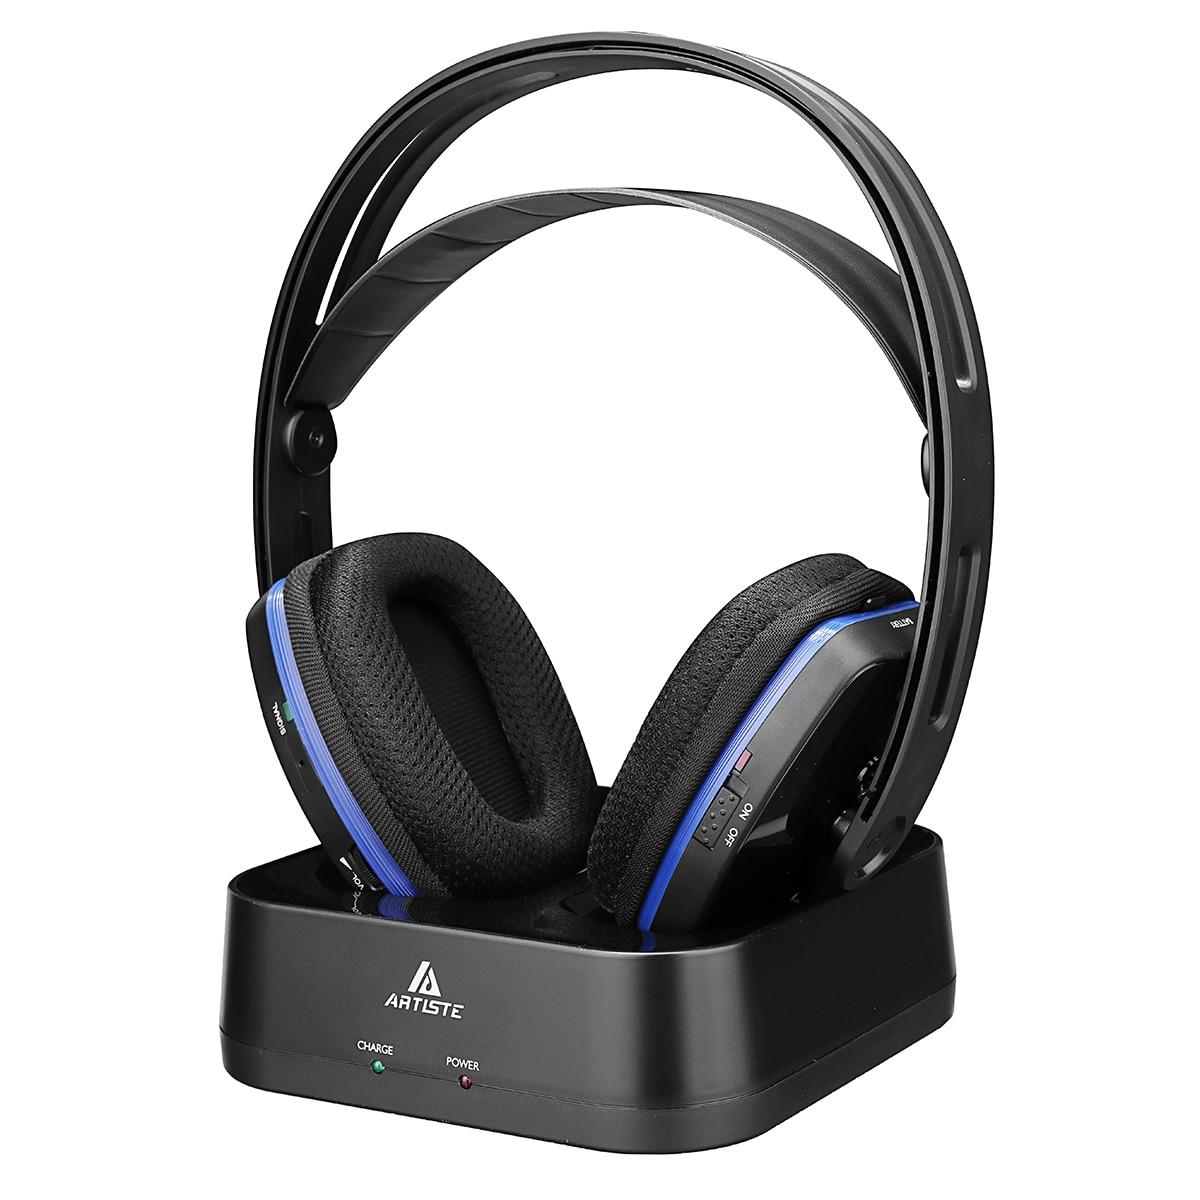 Artiste D2 2.4GHz HiFi Bluetooth Headphone Deep Bass Wireless TV Headphone With Transmitter Dock For Mobile Phone Music